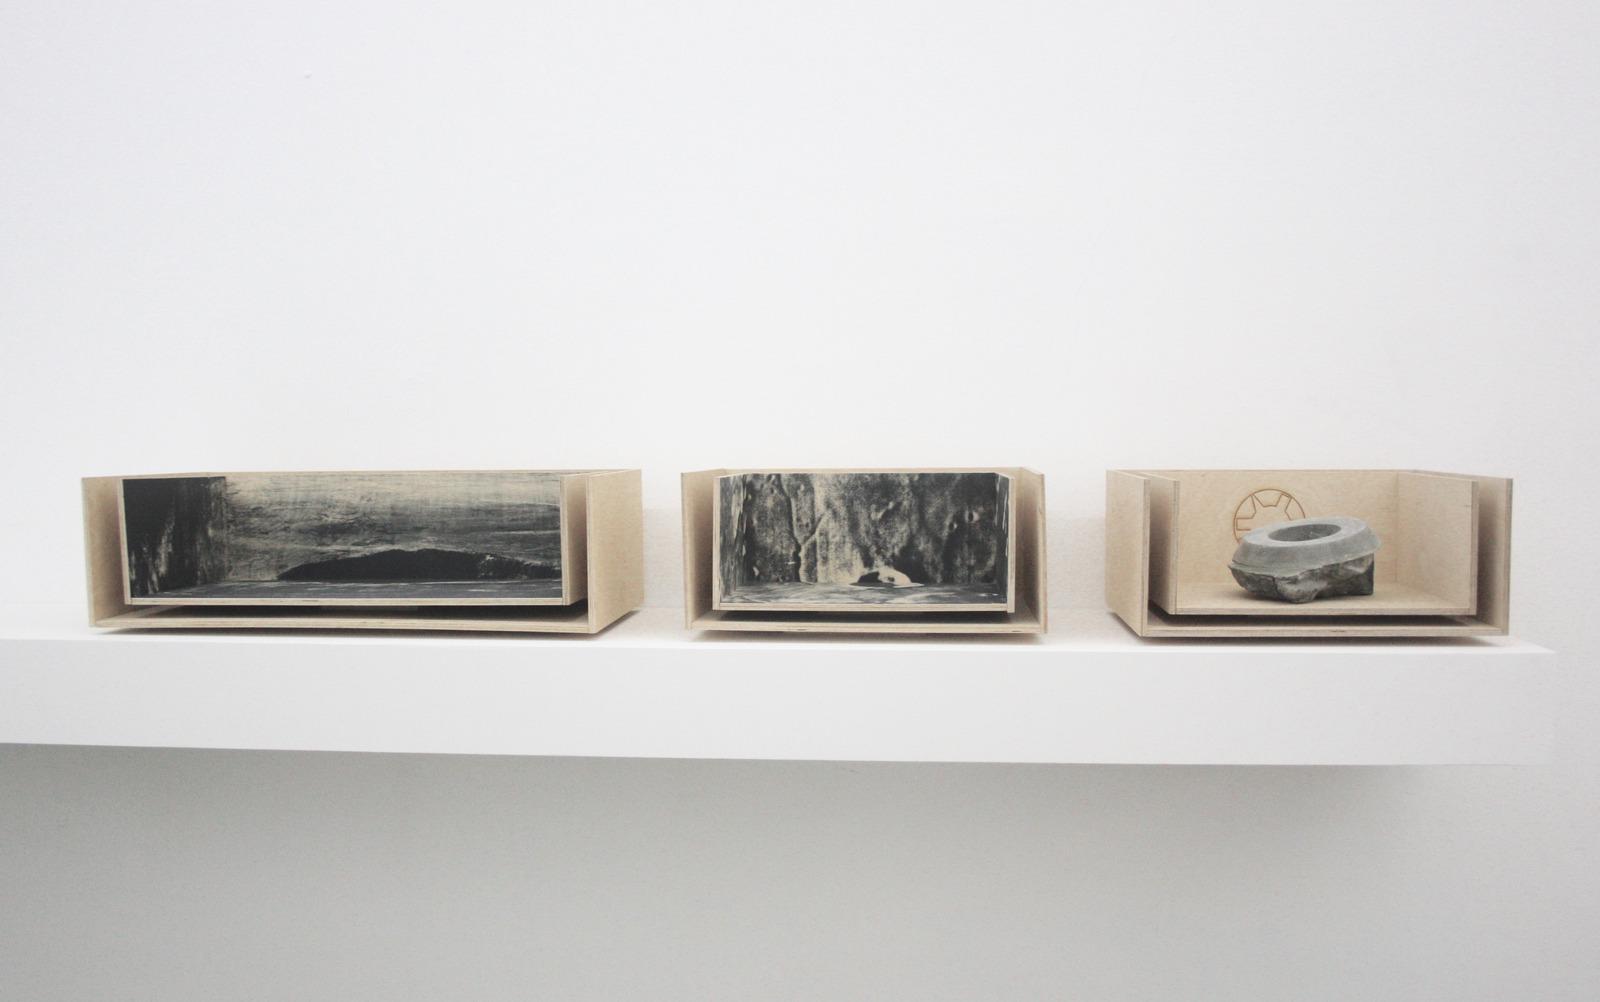 Katleen Vinck, Fractal, intallation view